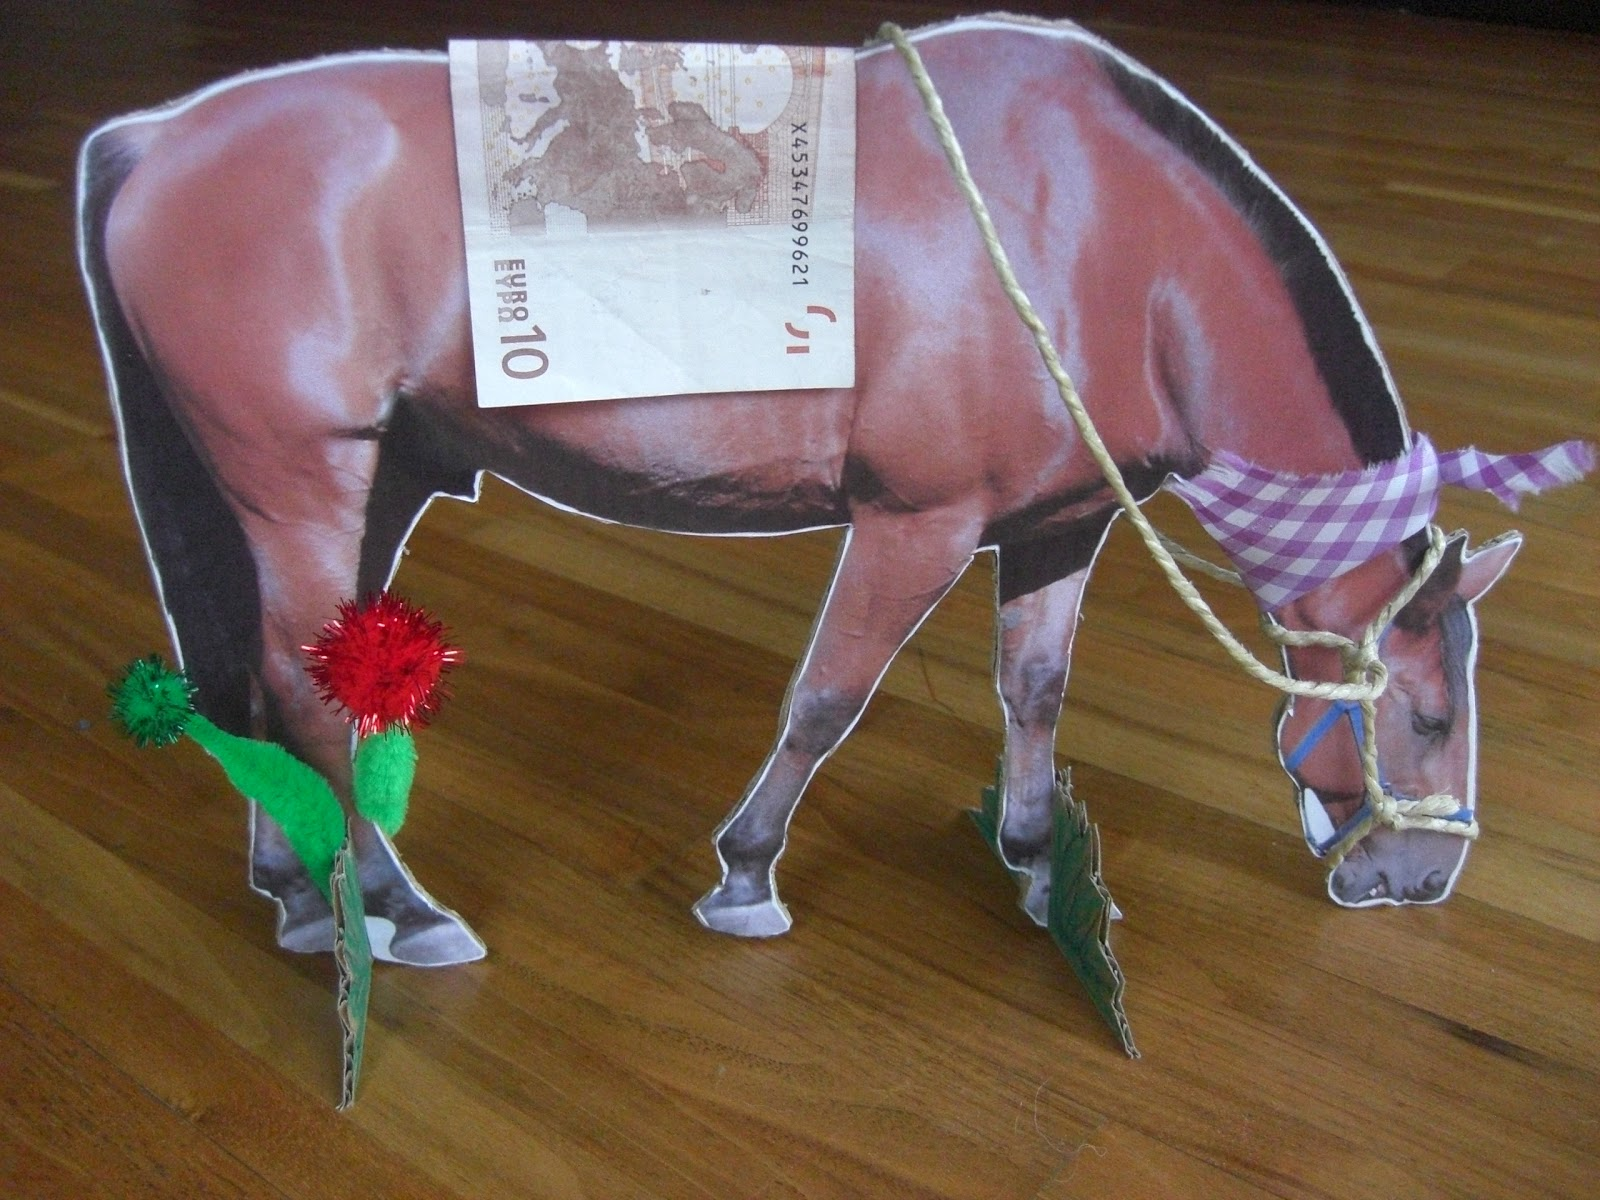 Uberall Nirgendwo Pferde Geburtstag Einladungen Oder Geldgeschenk